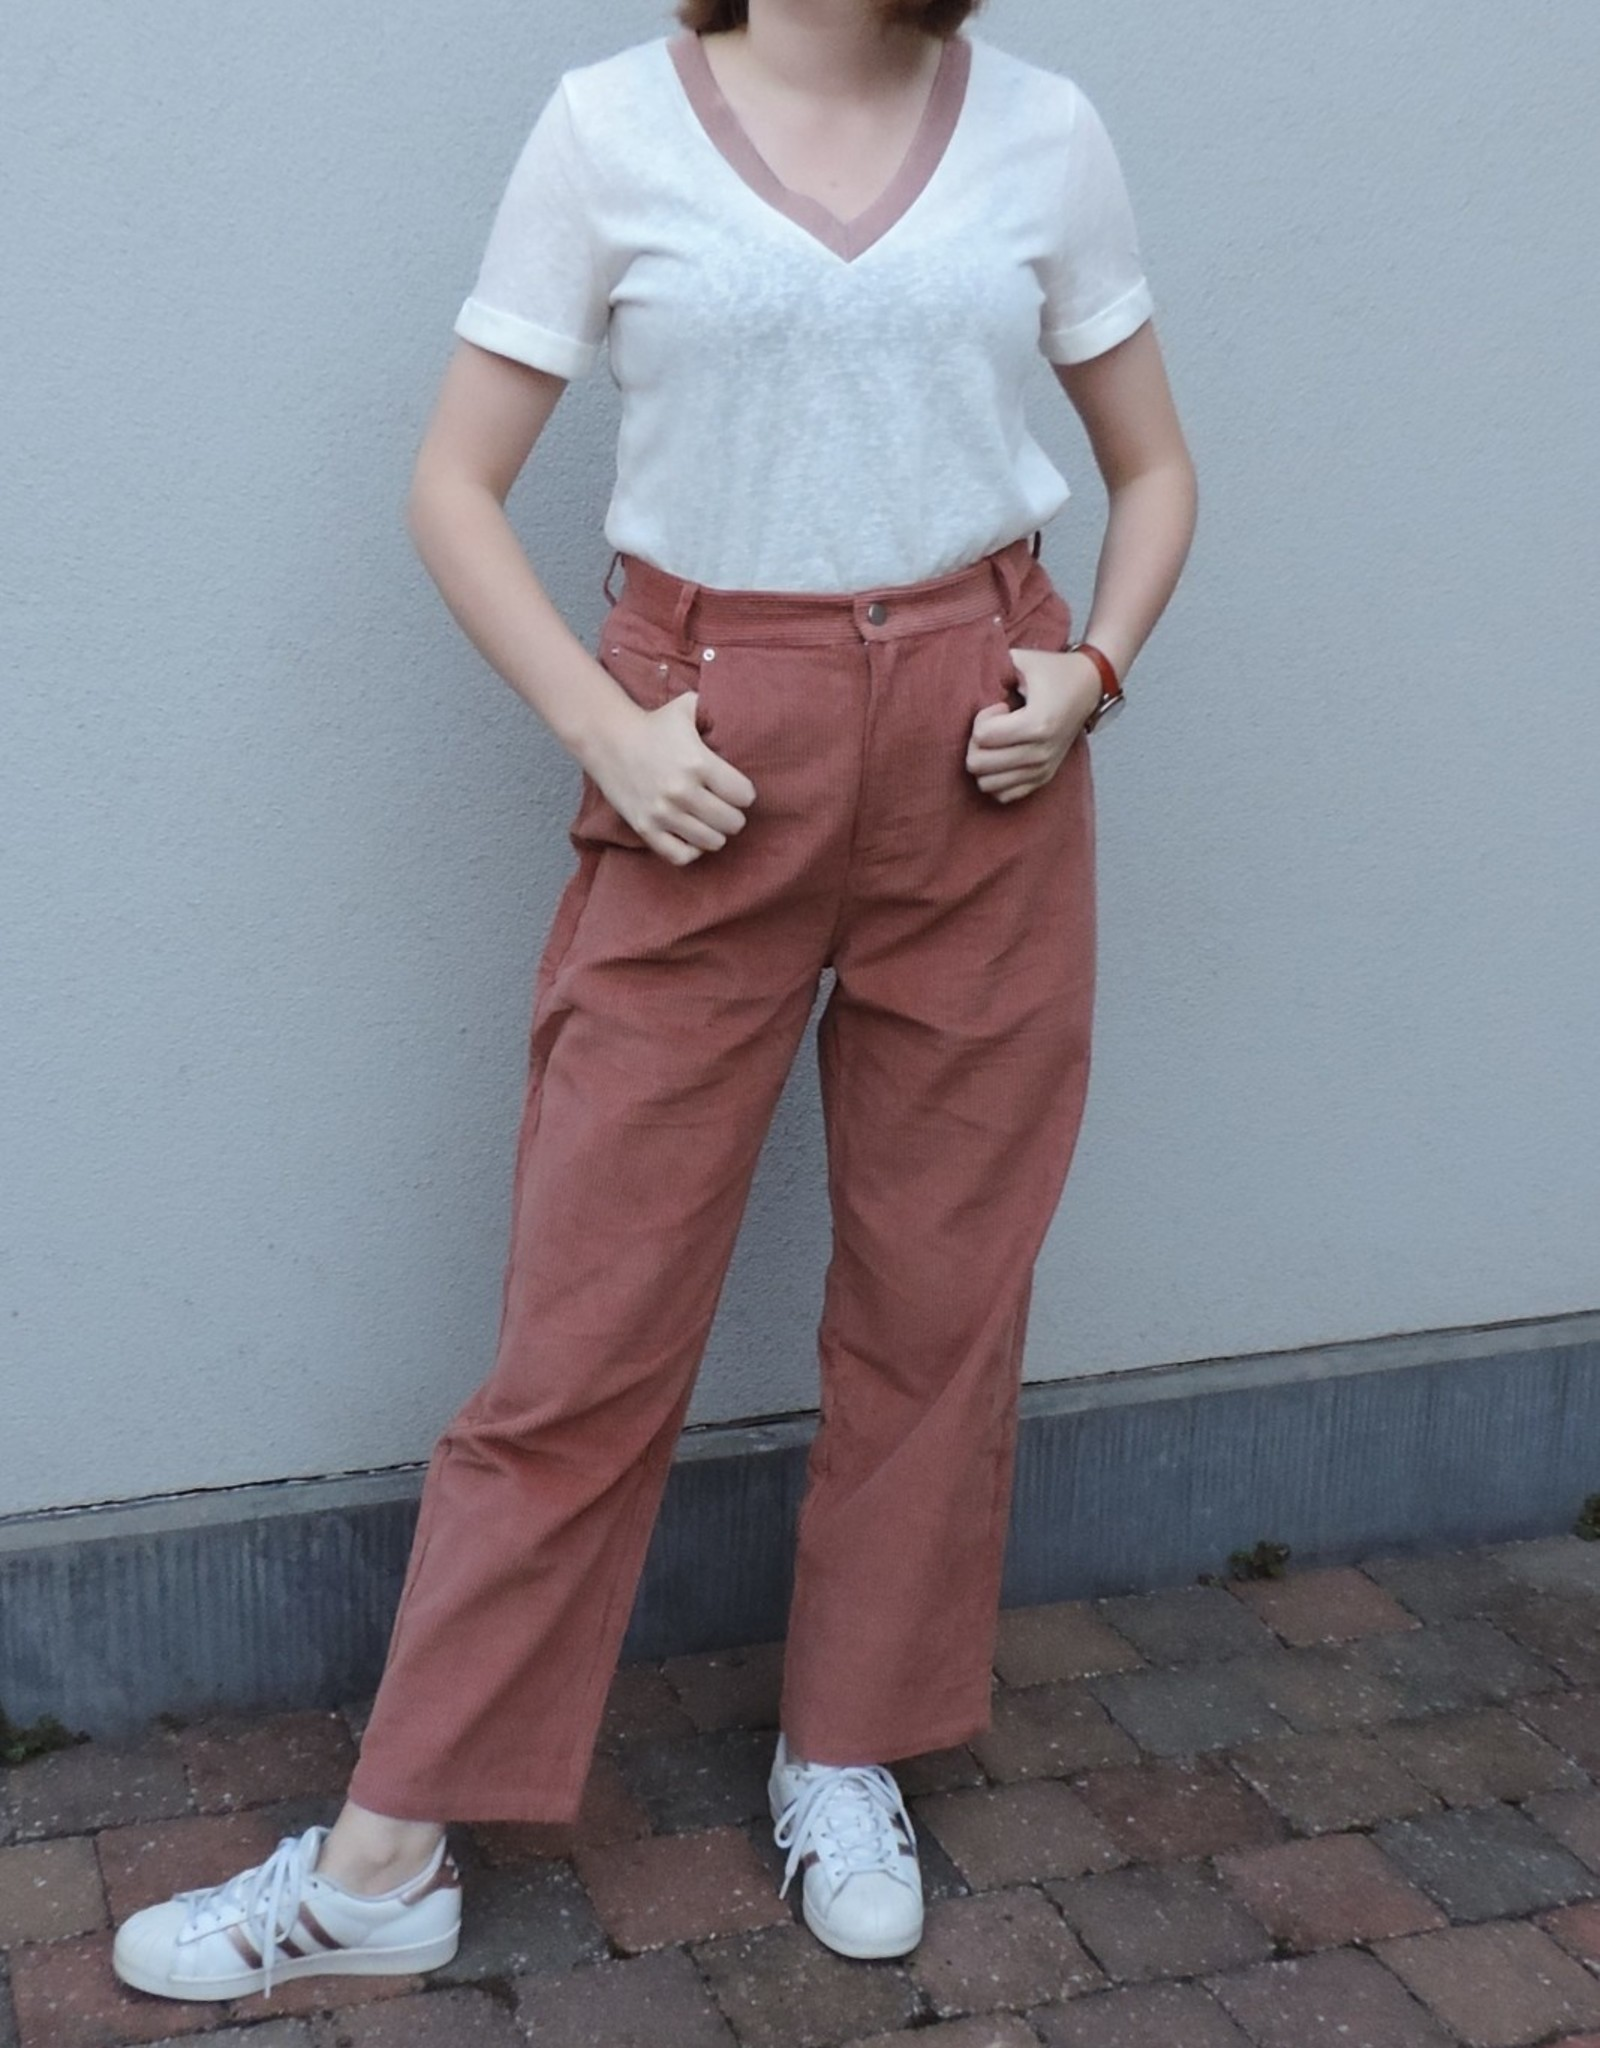 Bobby pants